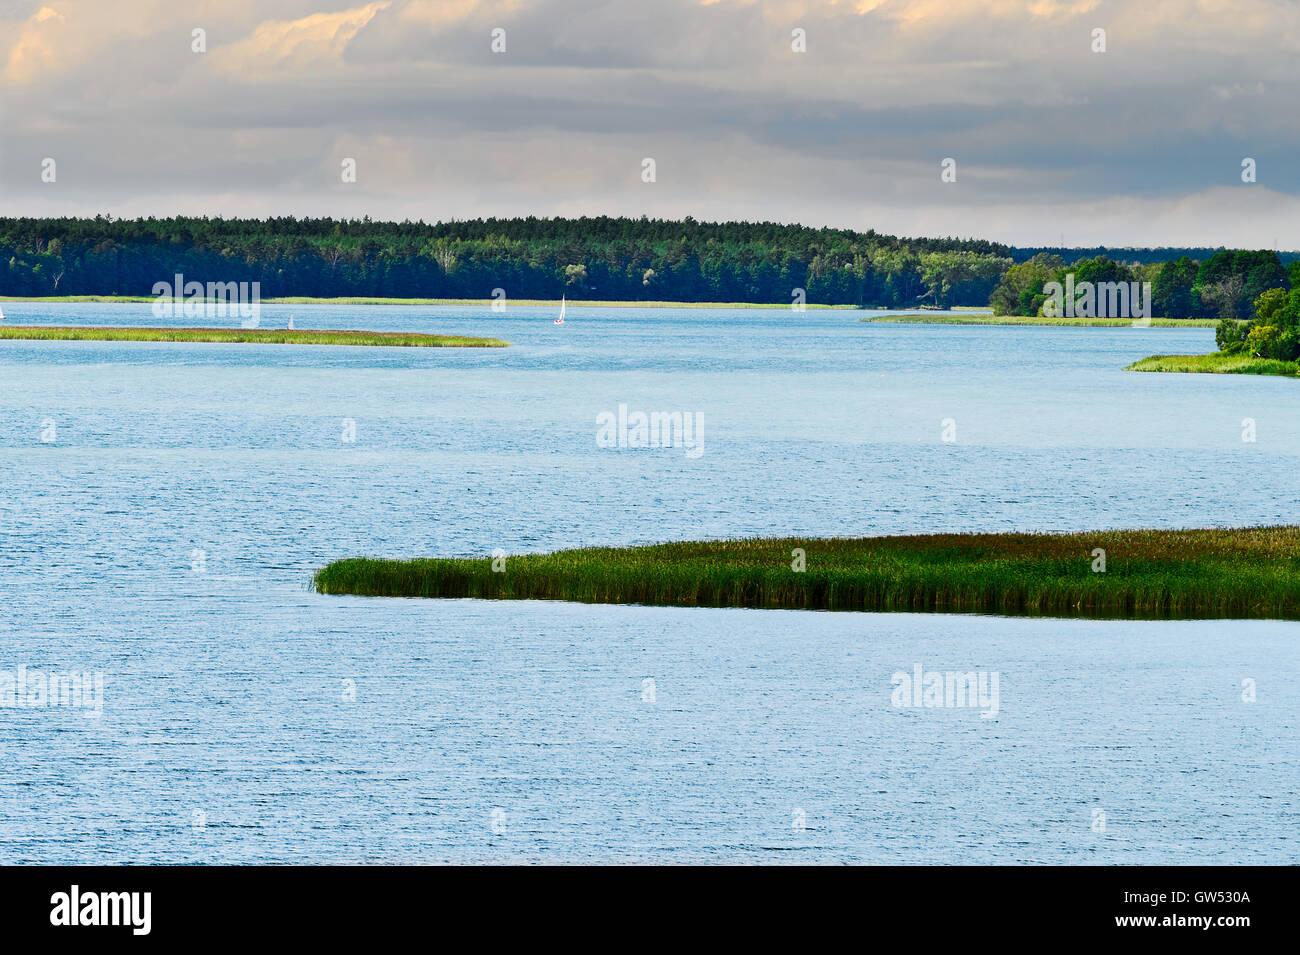 Aerial vast landscape with Rajgrodzkie Lake. Rajgrod, Podlaskie region, north-eastern Poland. - Stock Image